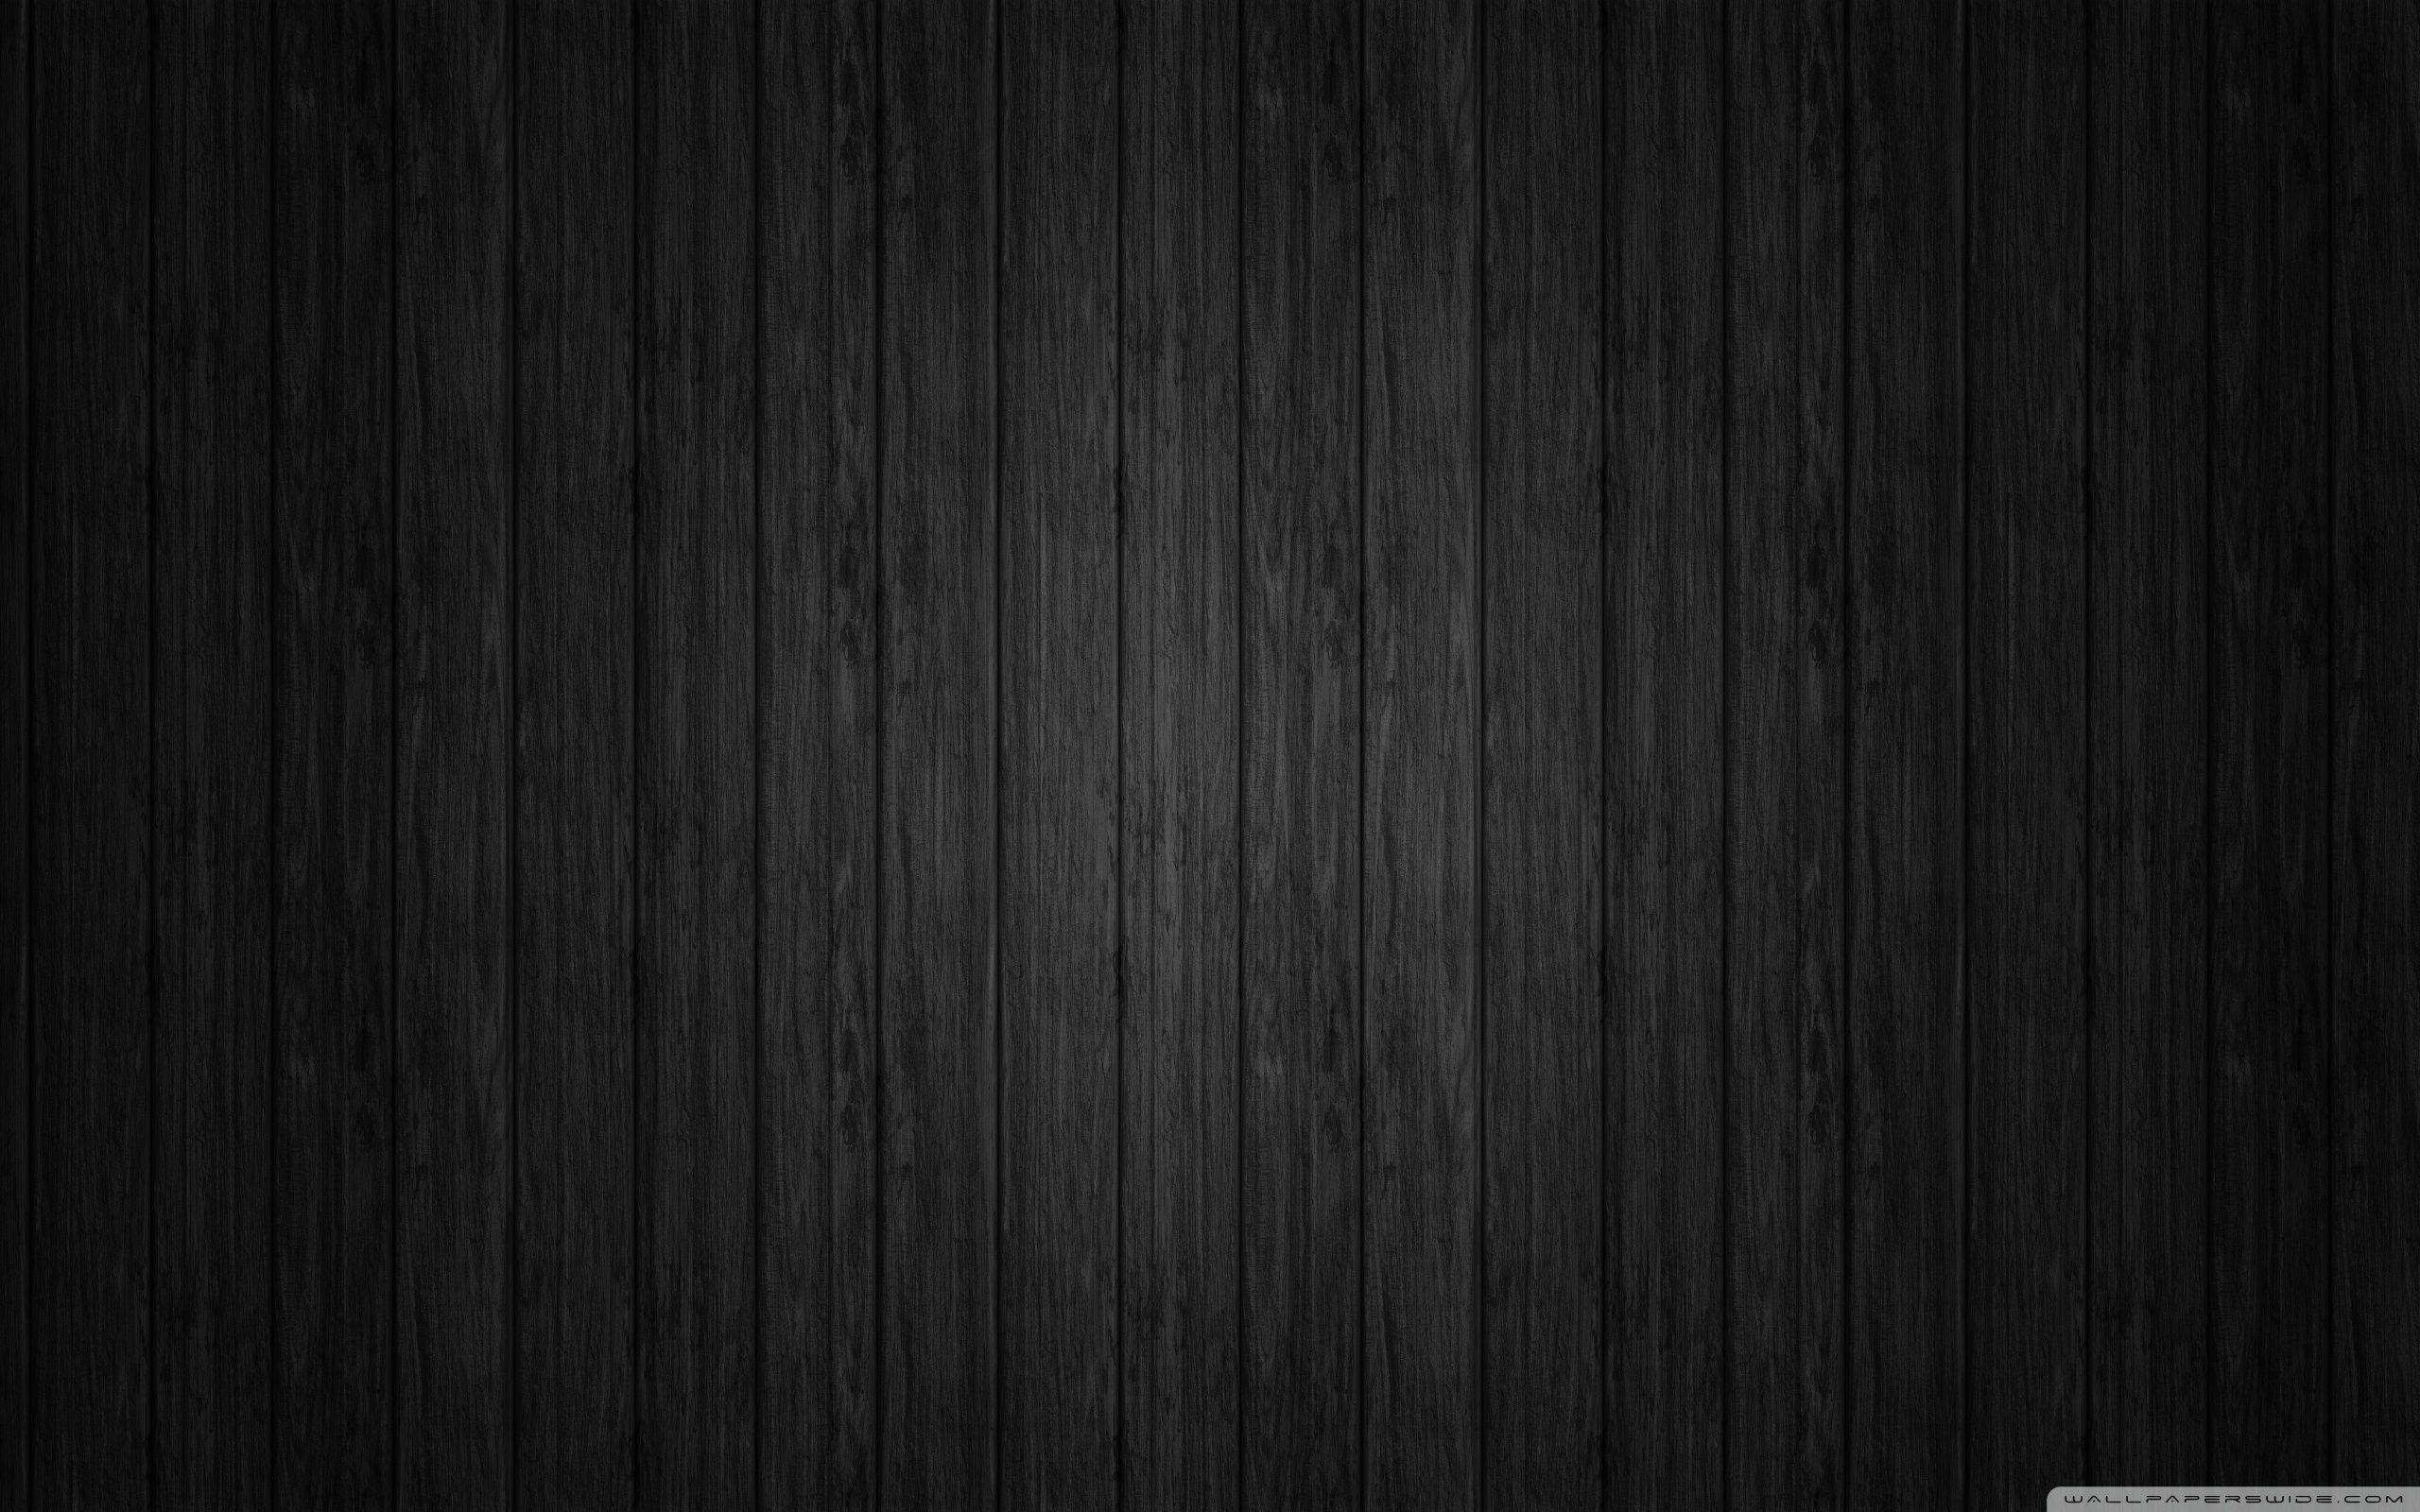 Res: 2560x1600, More 5 Wood Black Wallpaper Elegant